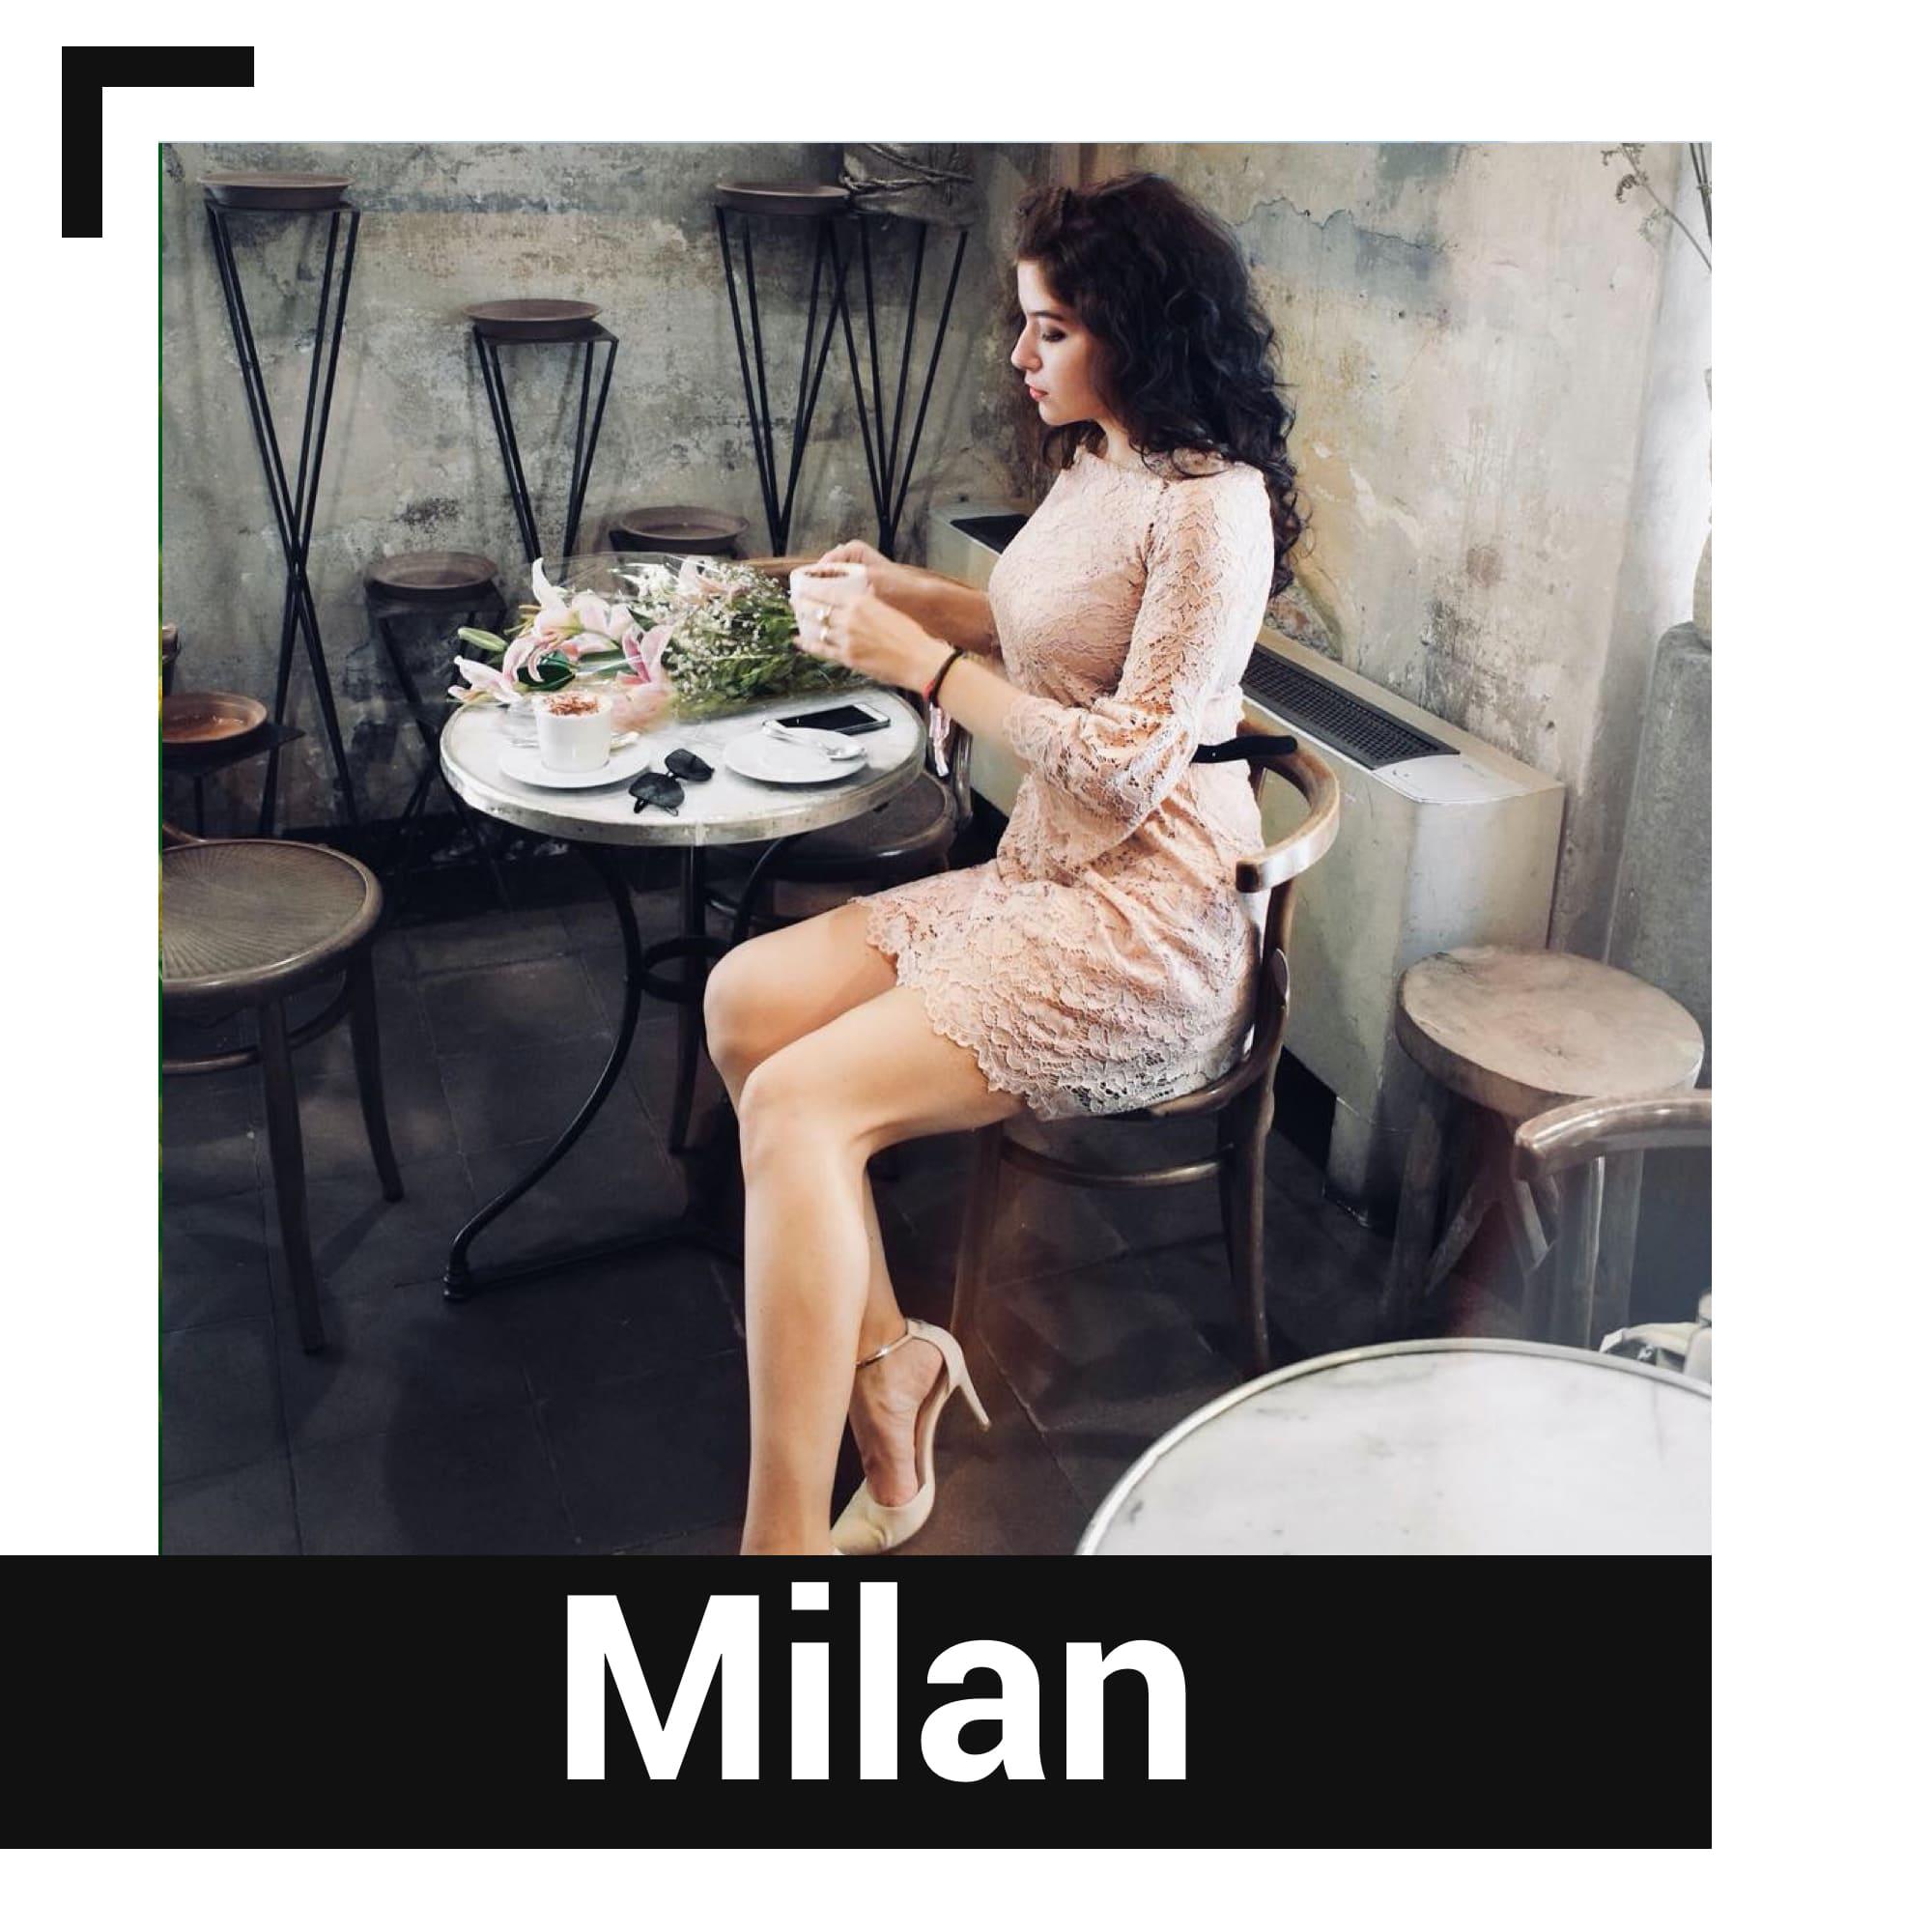 Fioraio Bianchi Caffe in Milan